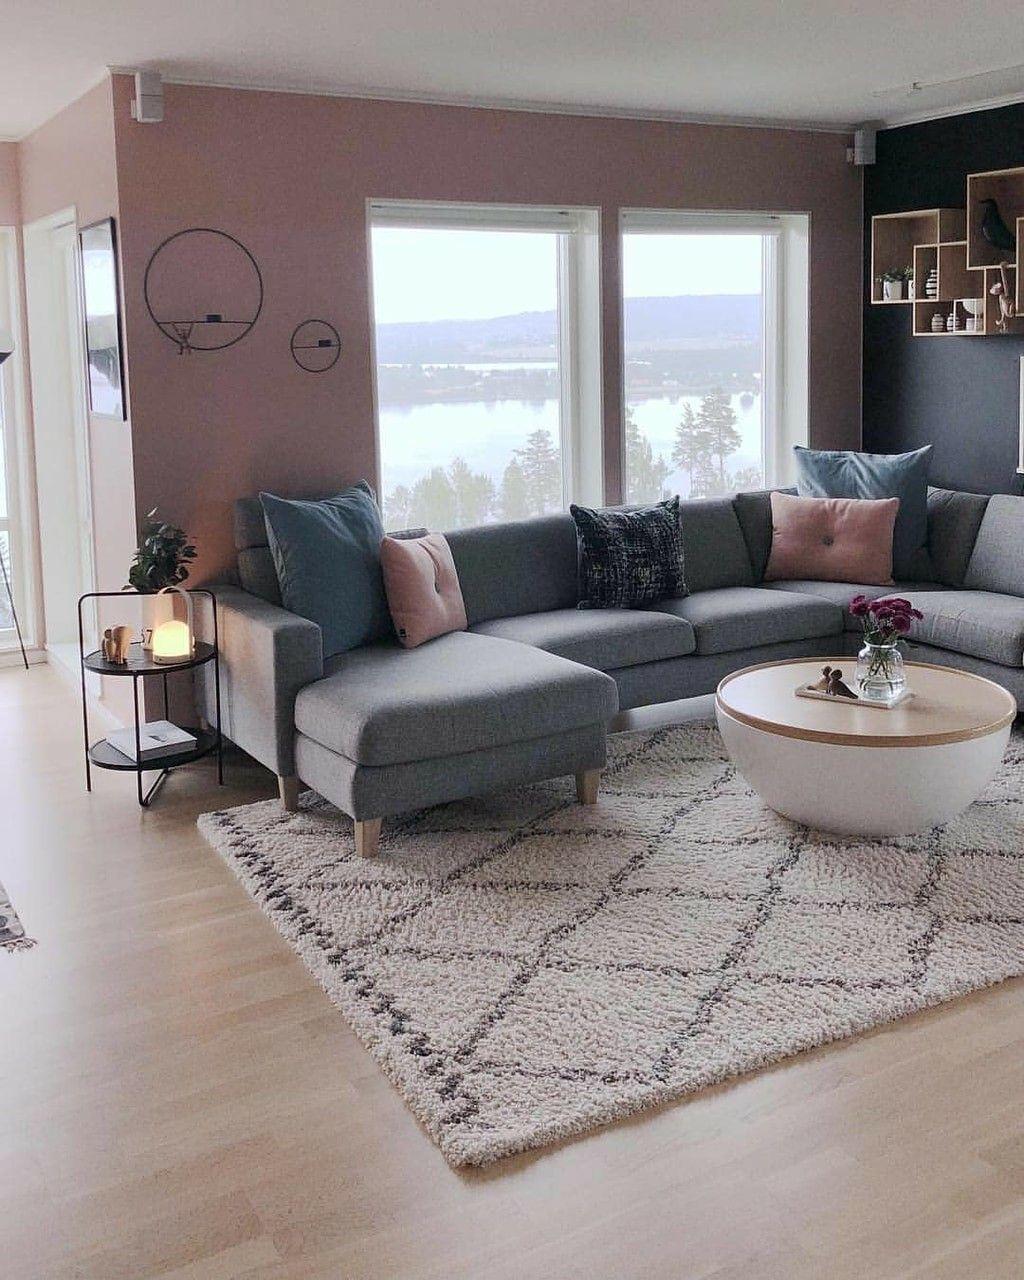 pinnegasi ♥ on interior design  big living rooms